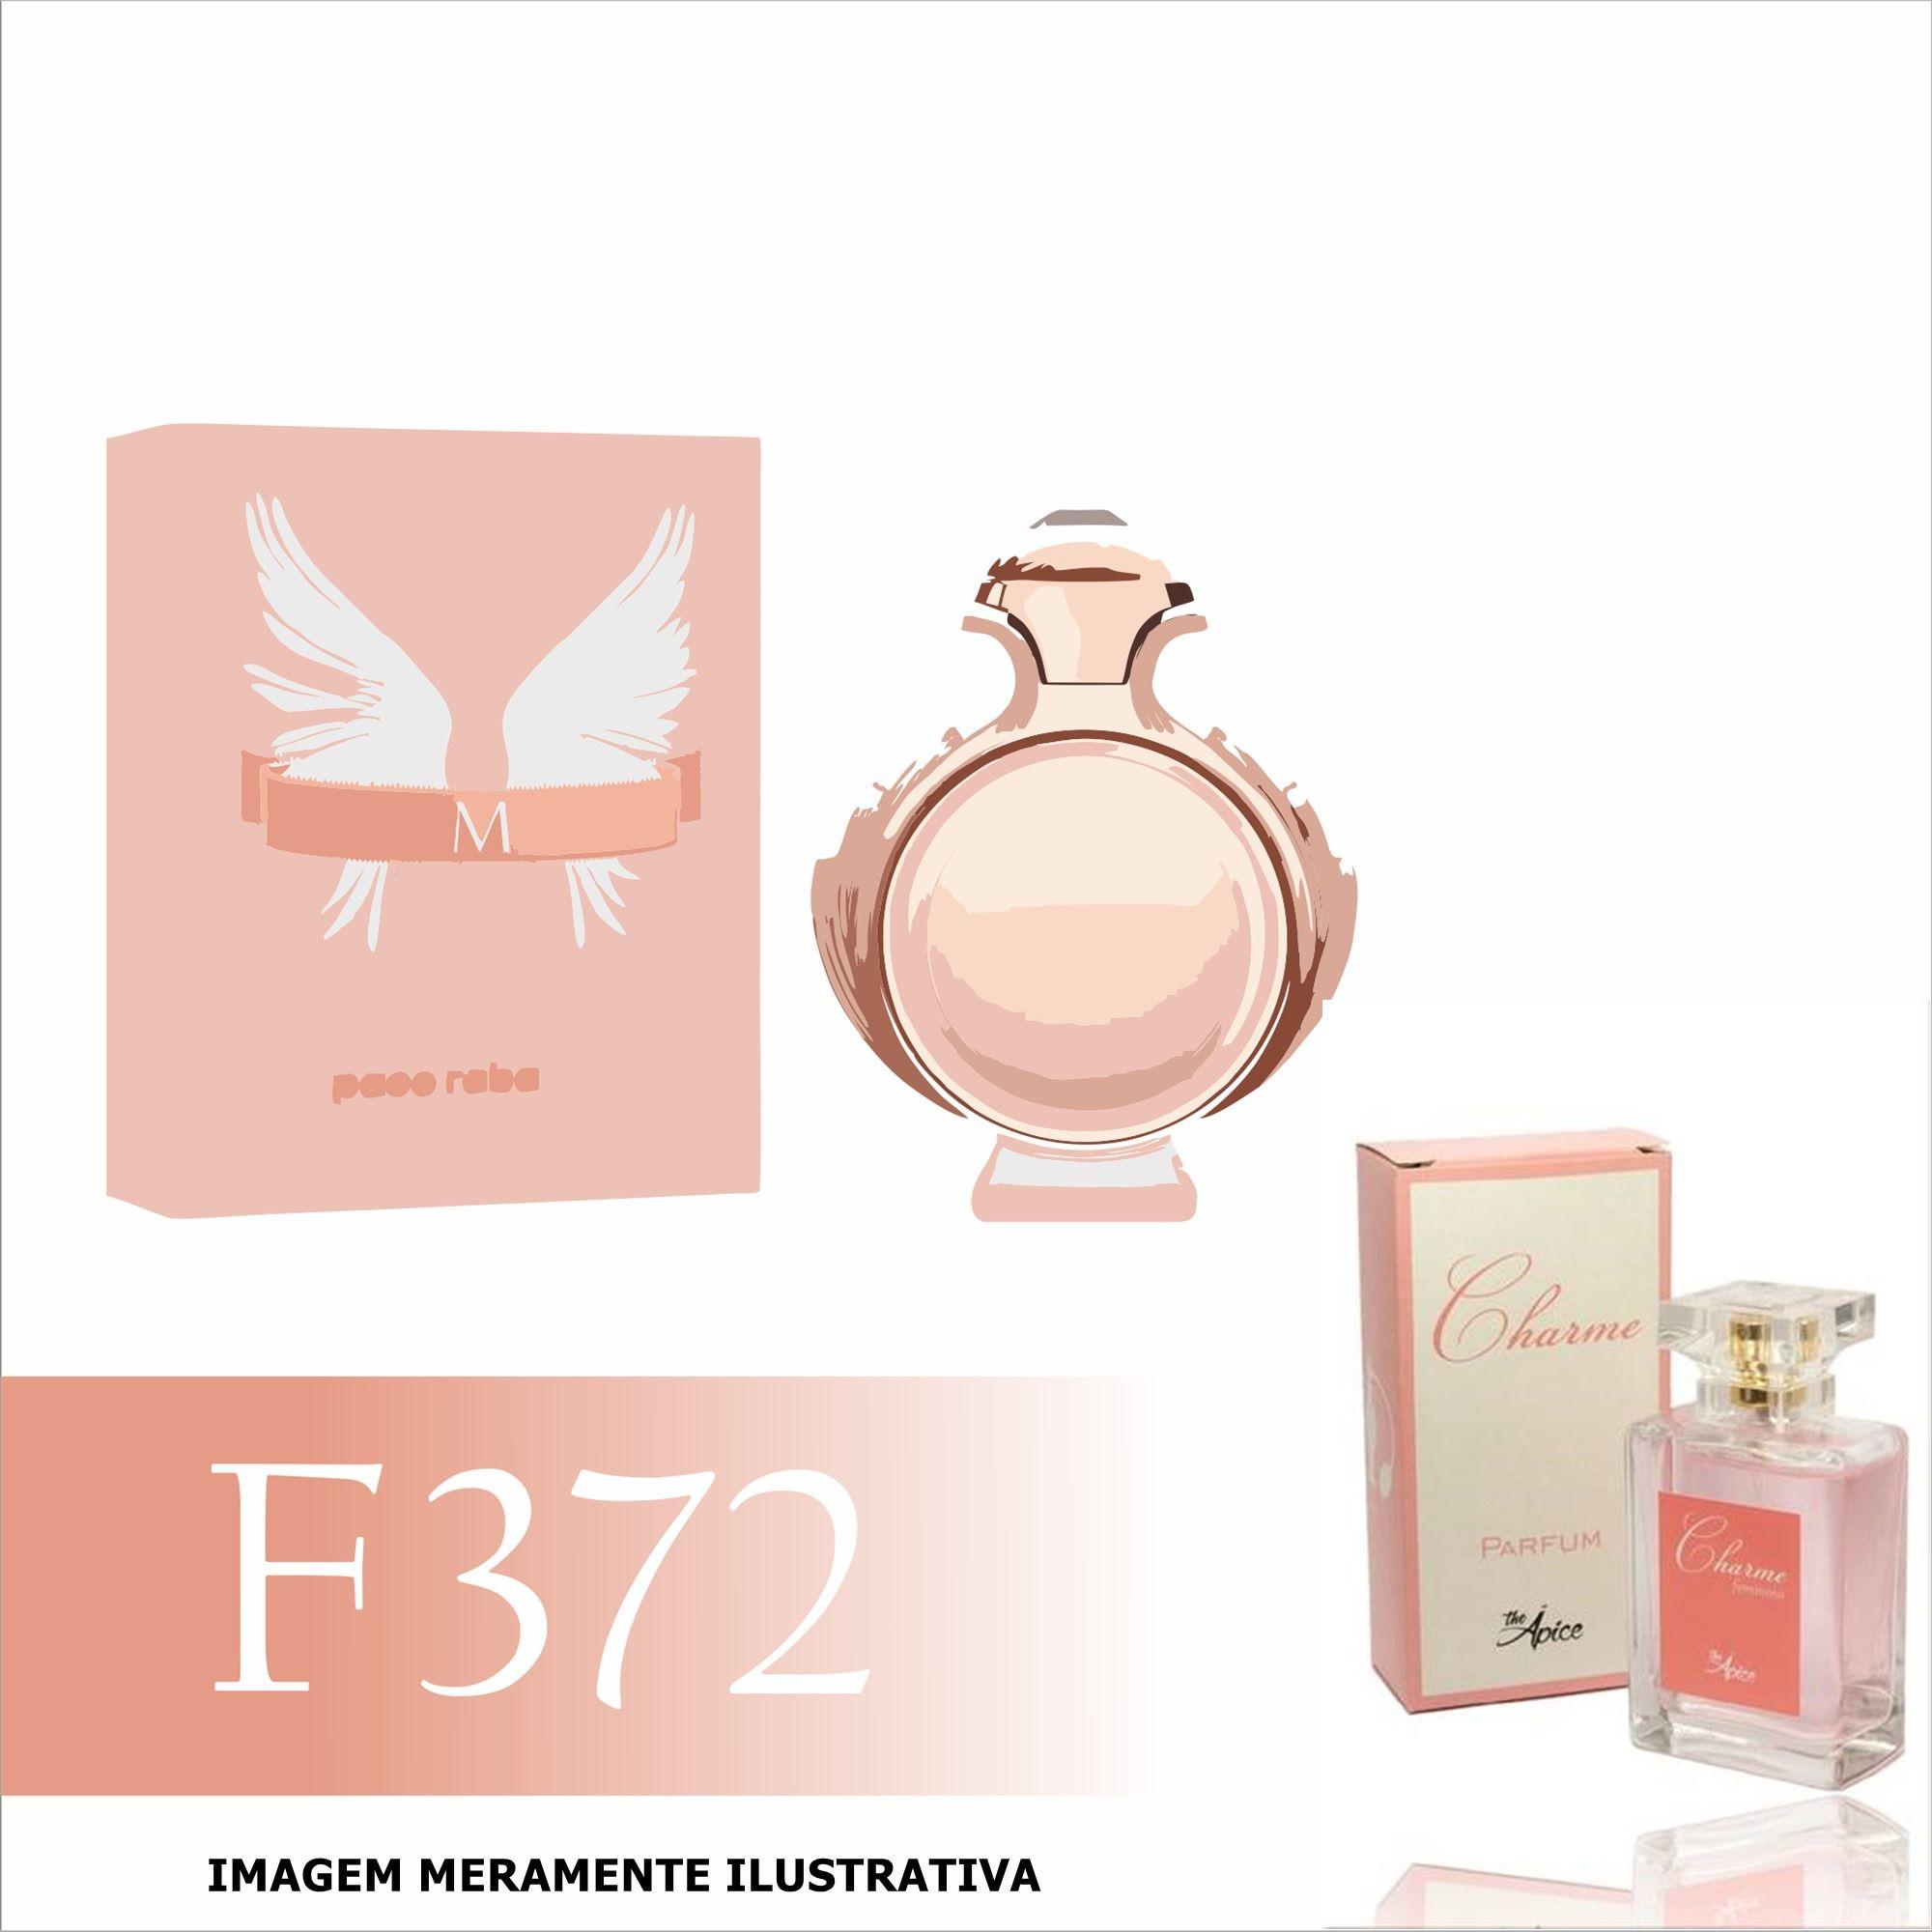 Perfume F372 Inspirado no Olympea da Paco Rabanne Feminino